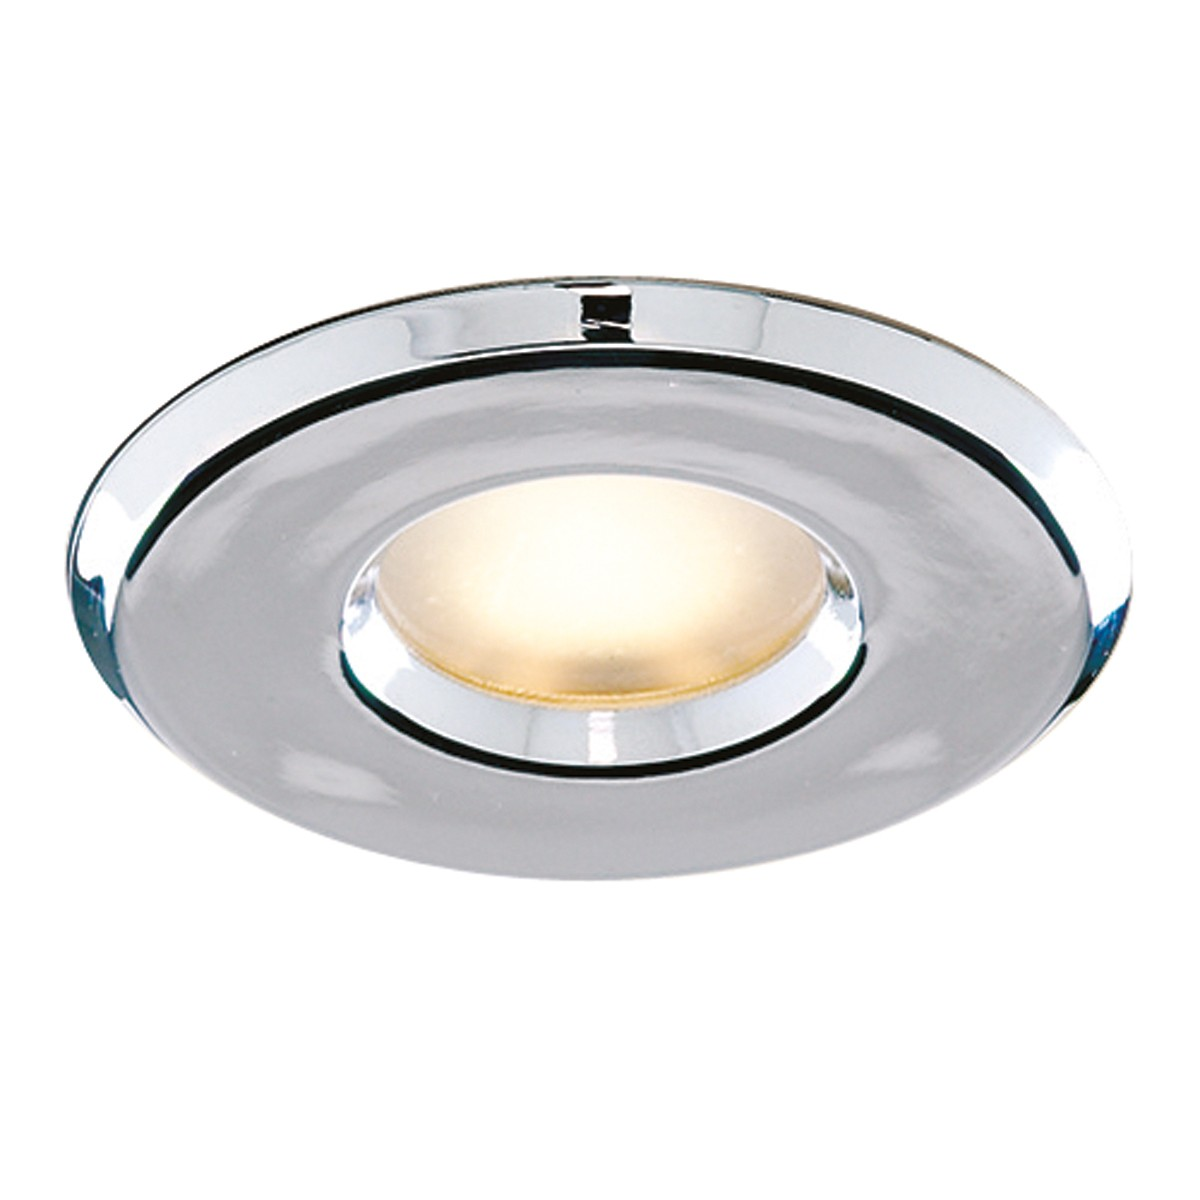 Bathroom Downlighter Recessed Chrome Halogen Shower Light Hegarty Lighting Ltd